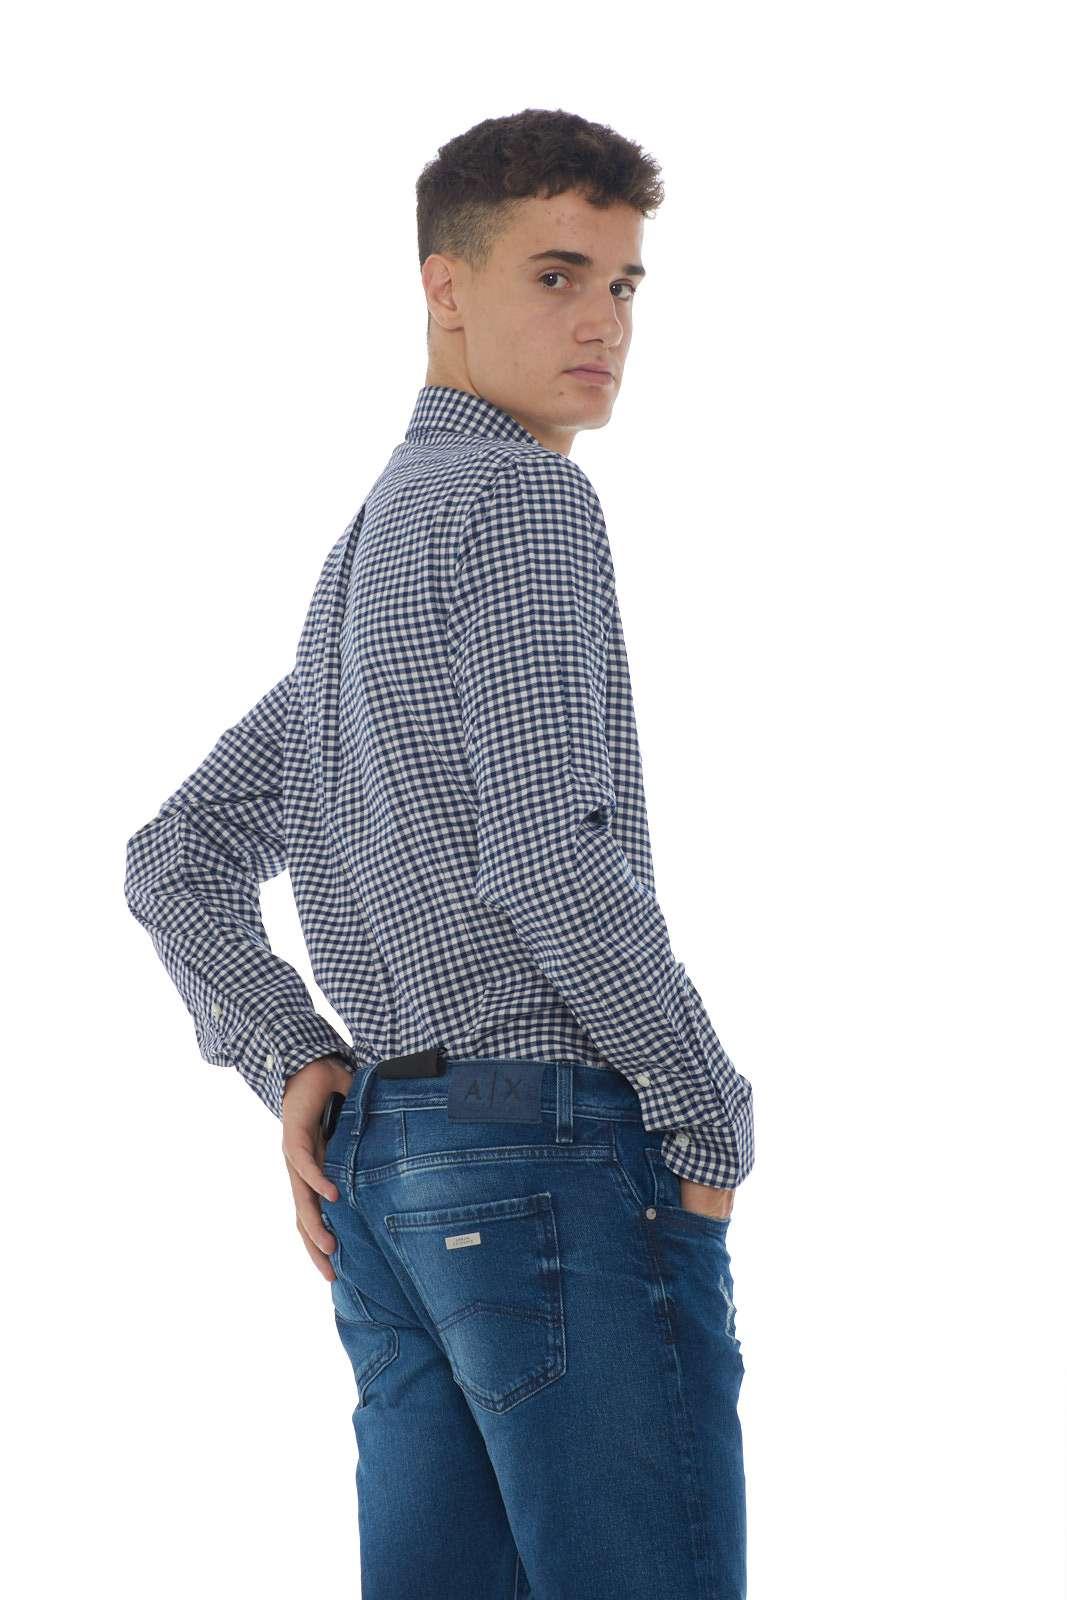 https://www.parmax.com/media/catalog/product/a/i/AI-outlet_parmax-camicia-uomo-Ralph-Lauren-710767420001-C.jpg